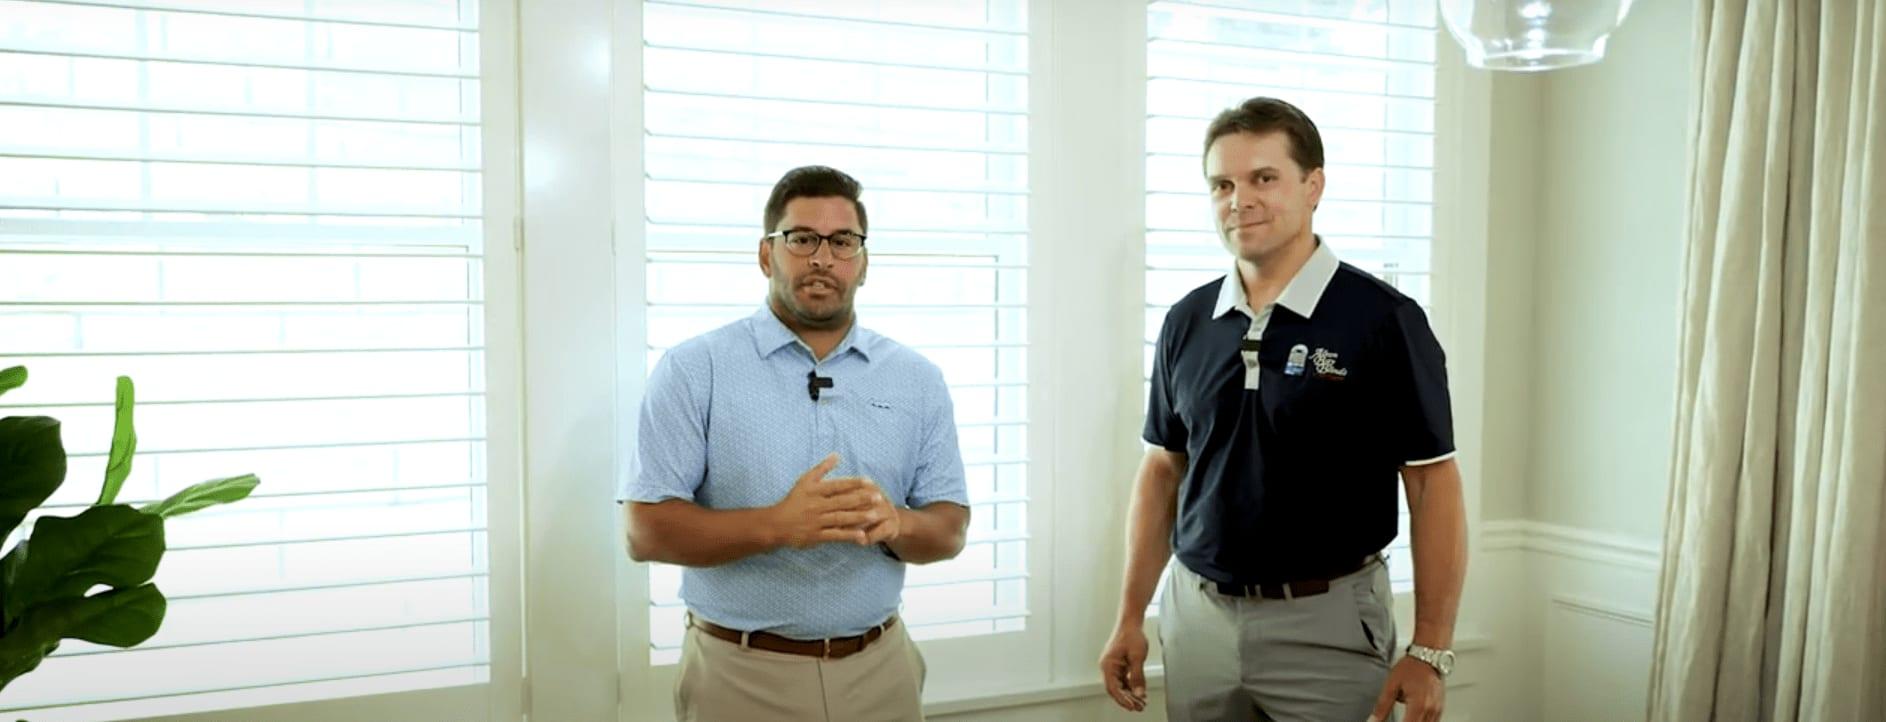 Alton Bay Blinds video preview